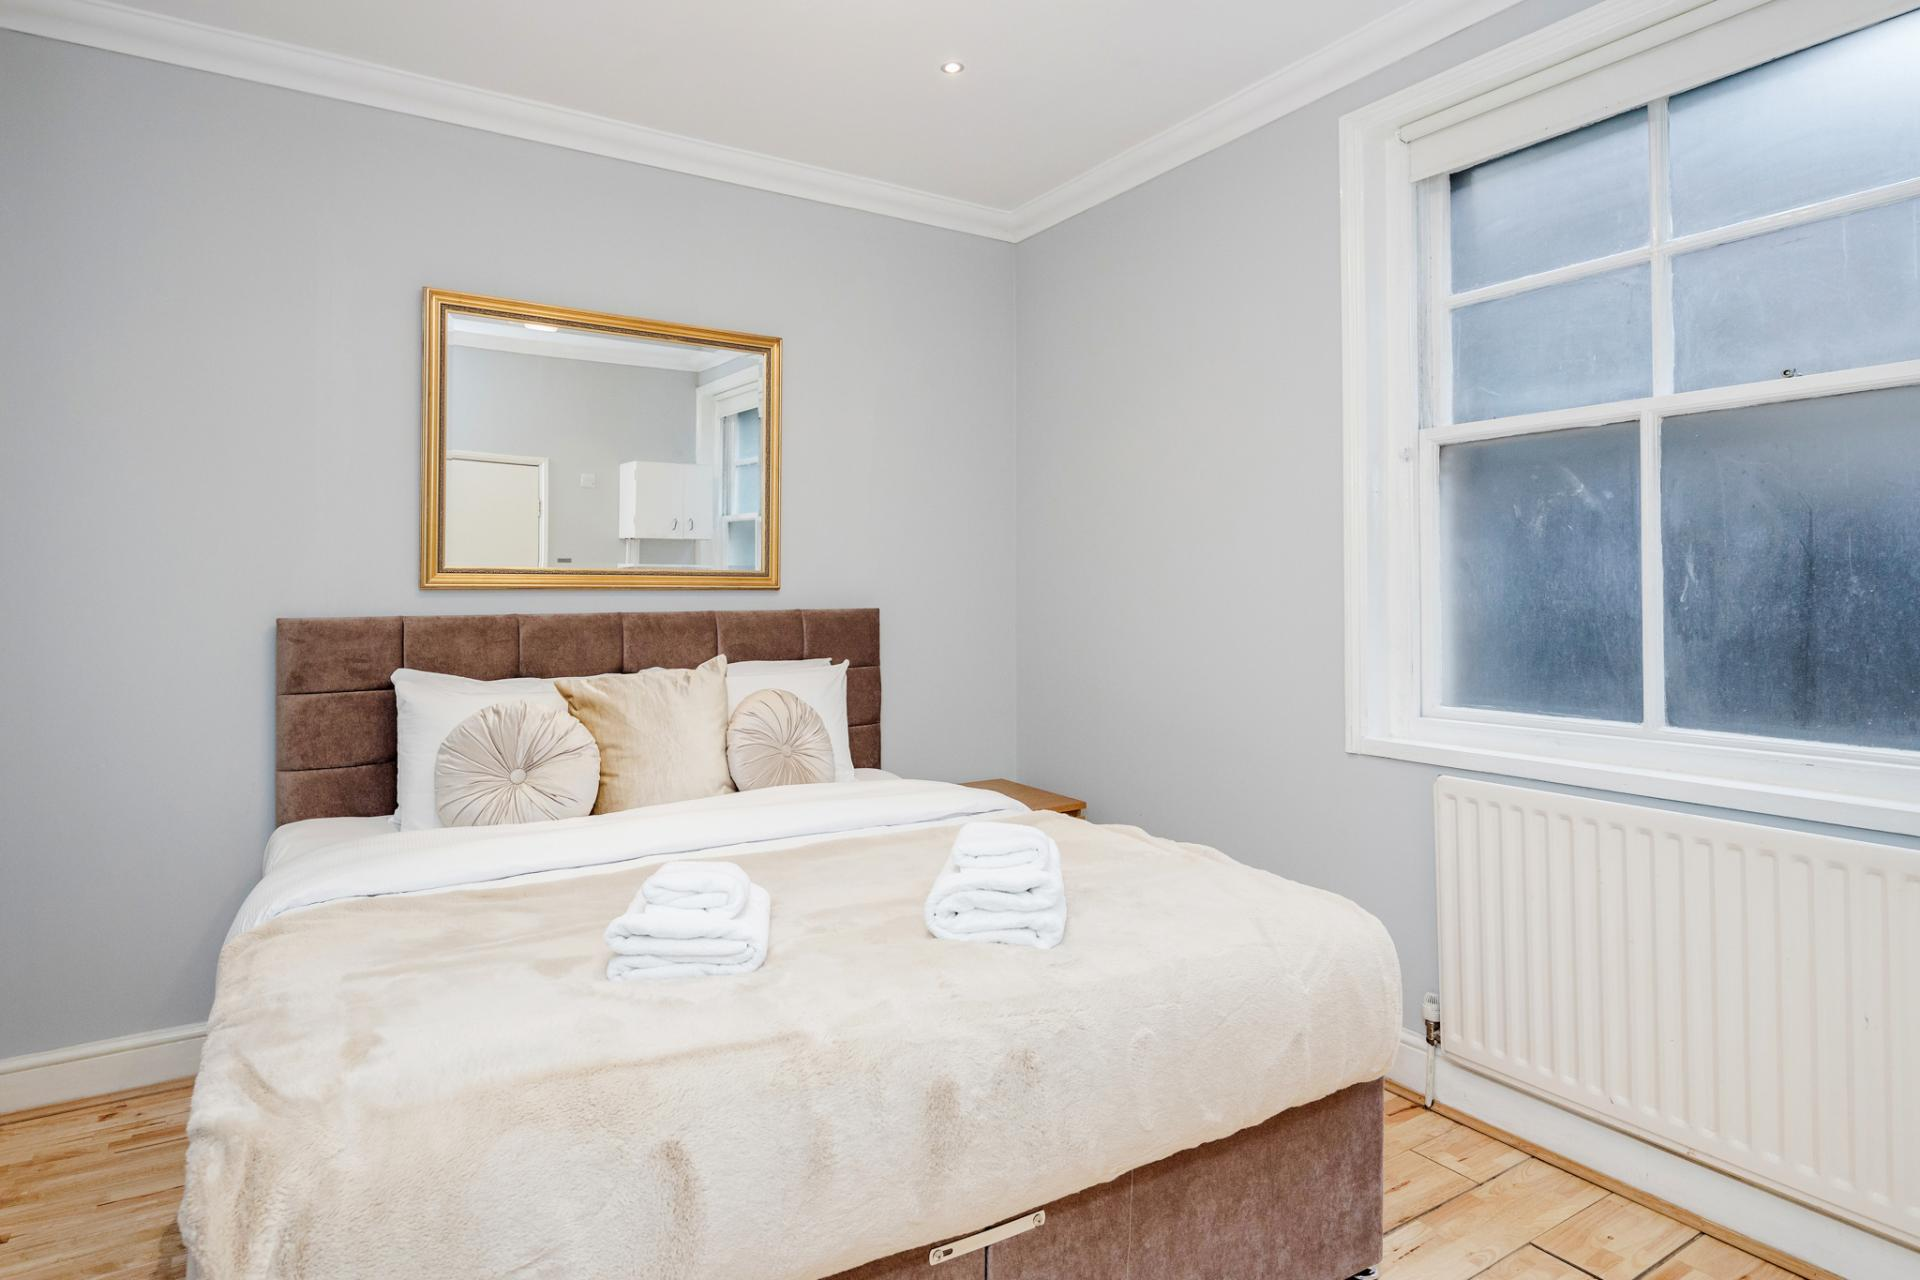 Bed at Kensington High Street, Kensington, London - Citybase Apartments